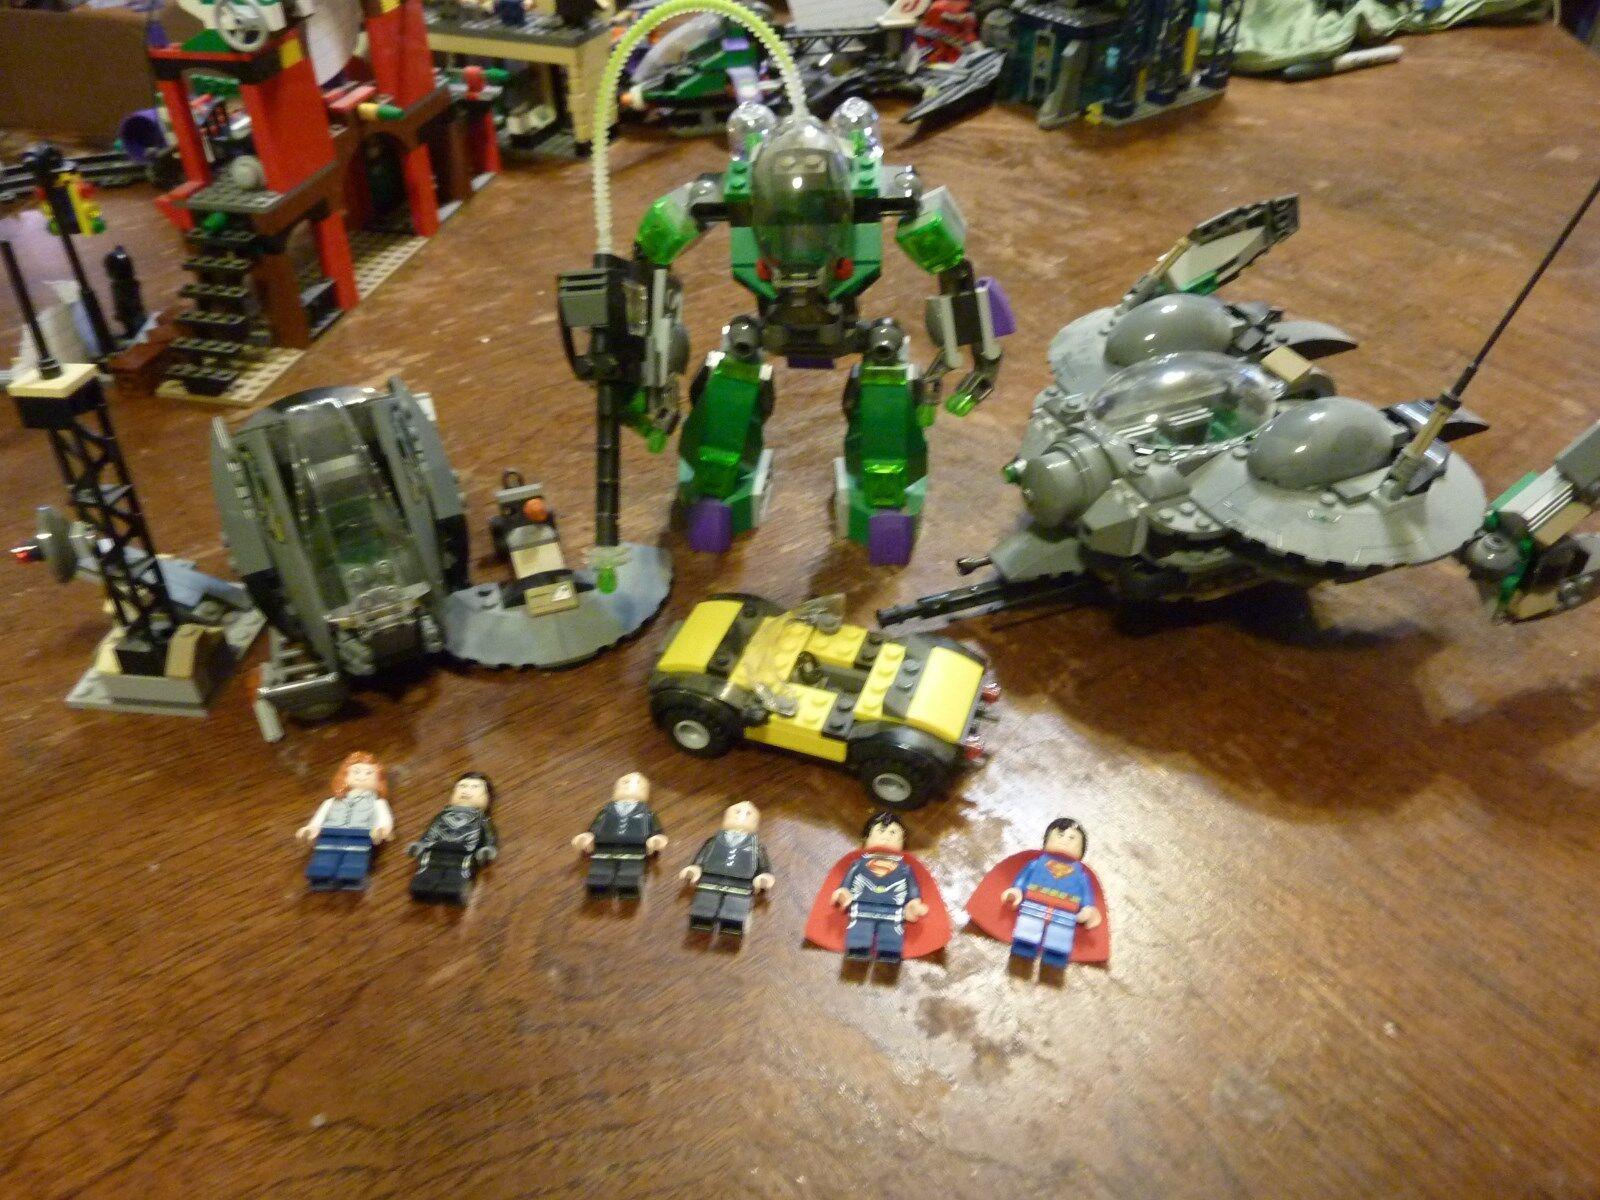 Lego Superhomme  Super Heroes Set Lot 76003 76009 6862 76002 Minifigures Parts  offrant 100%